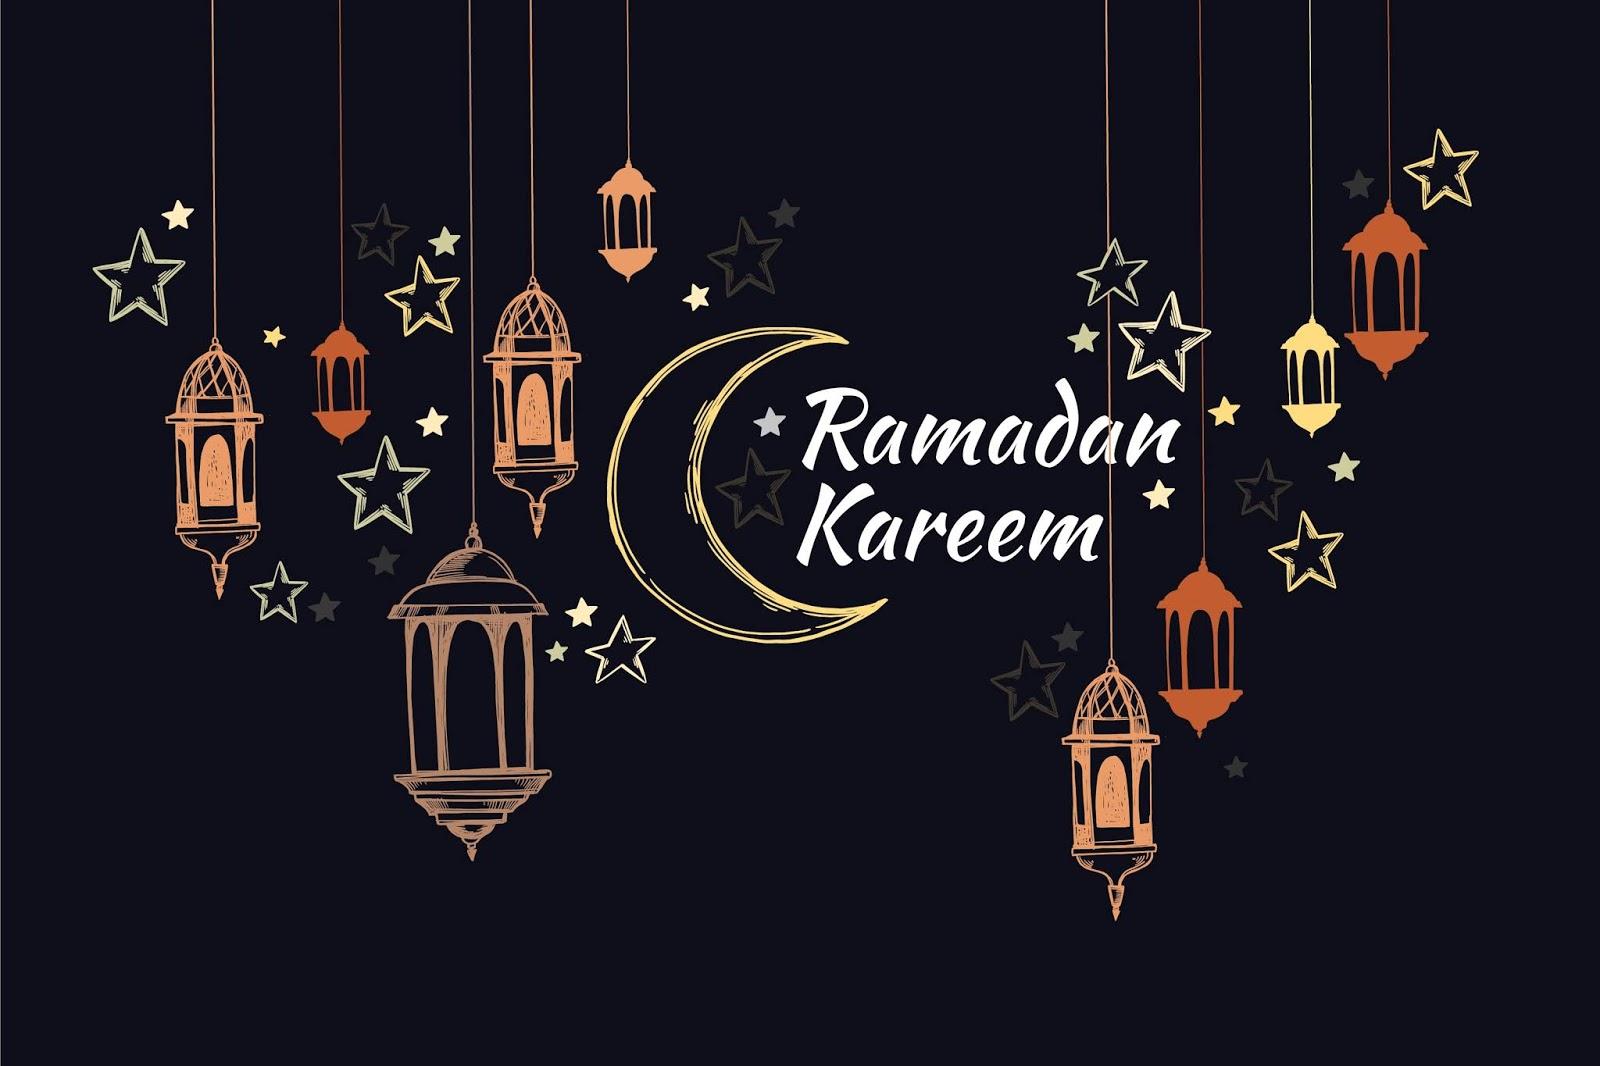 Ramadan-Kareem-Images-HD-Wallpaper